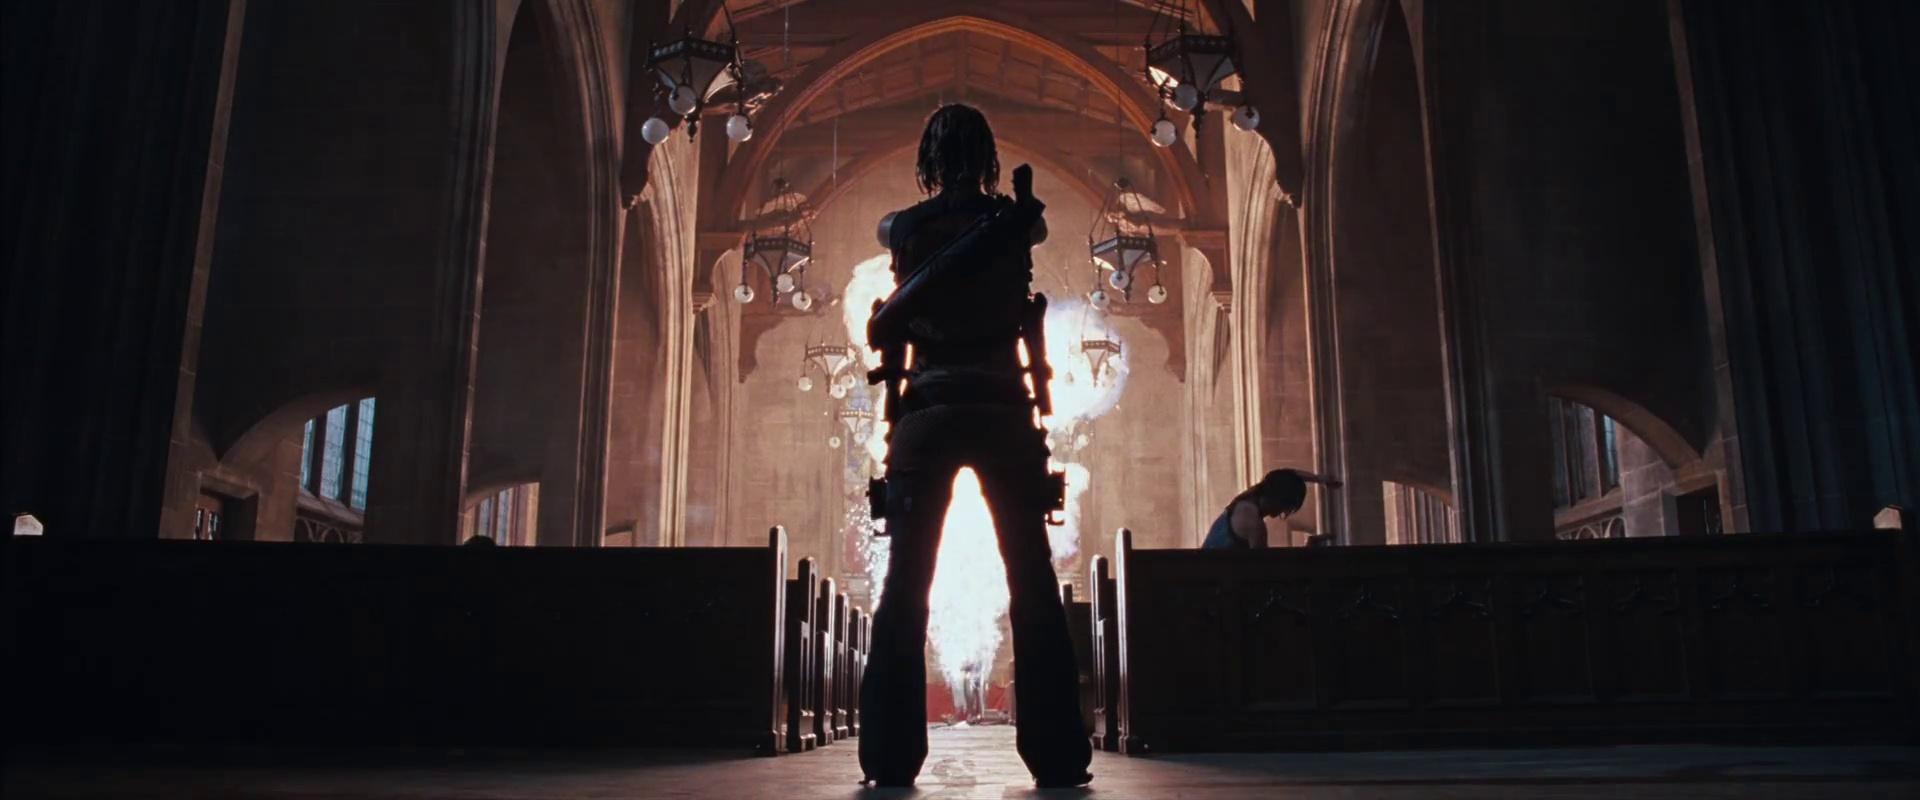 Galerie Resident Evil: Apocalypse 5